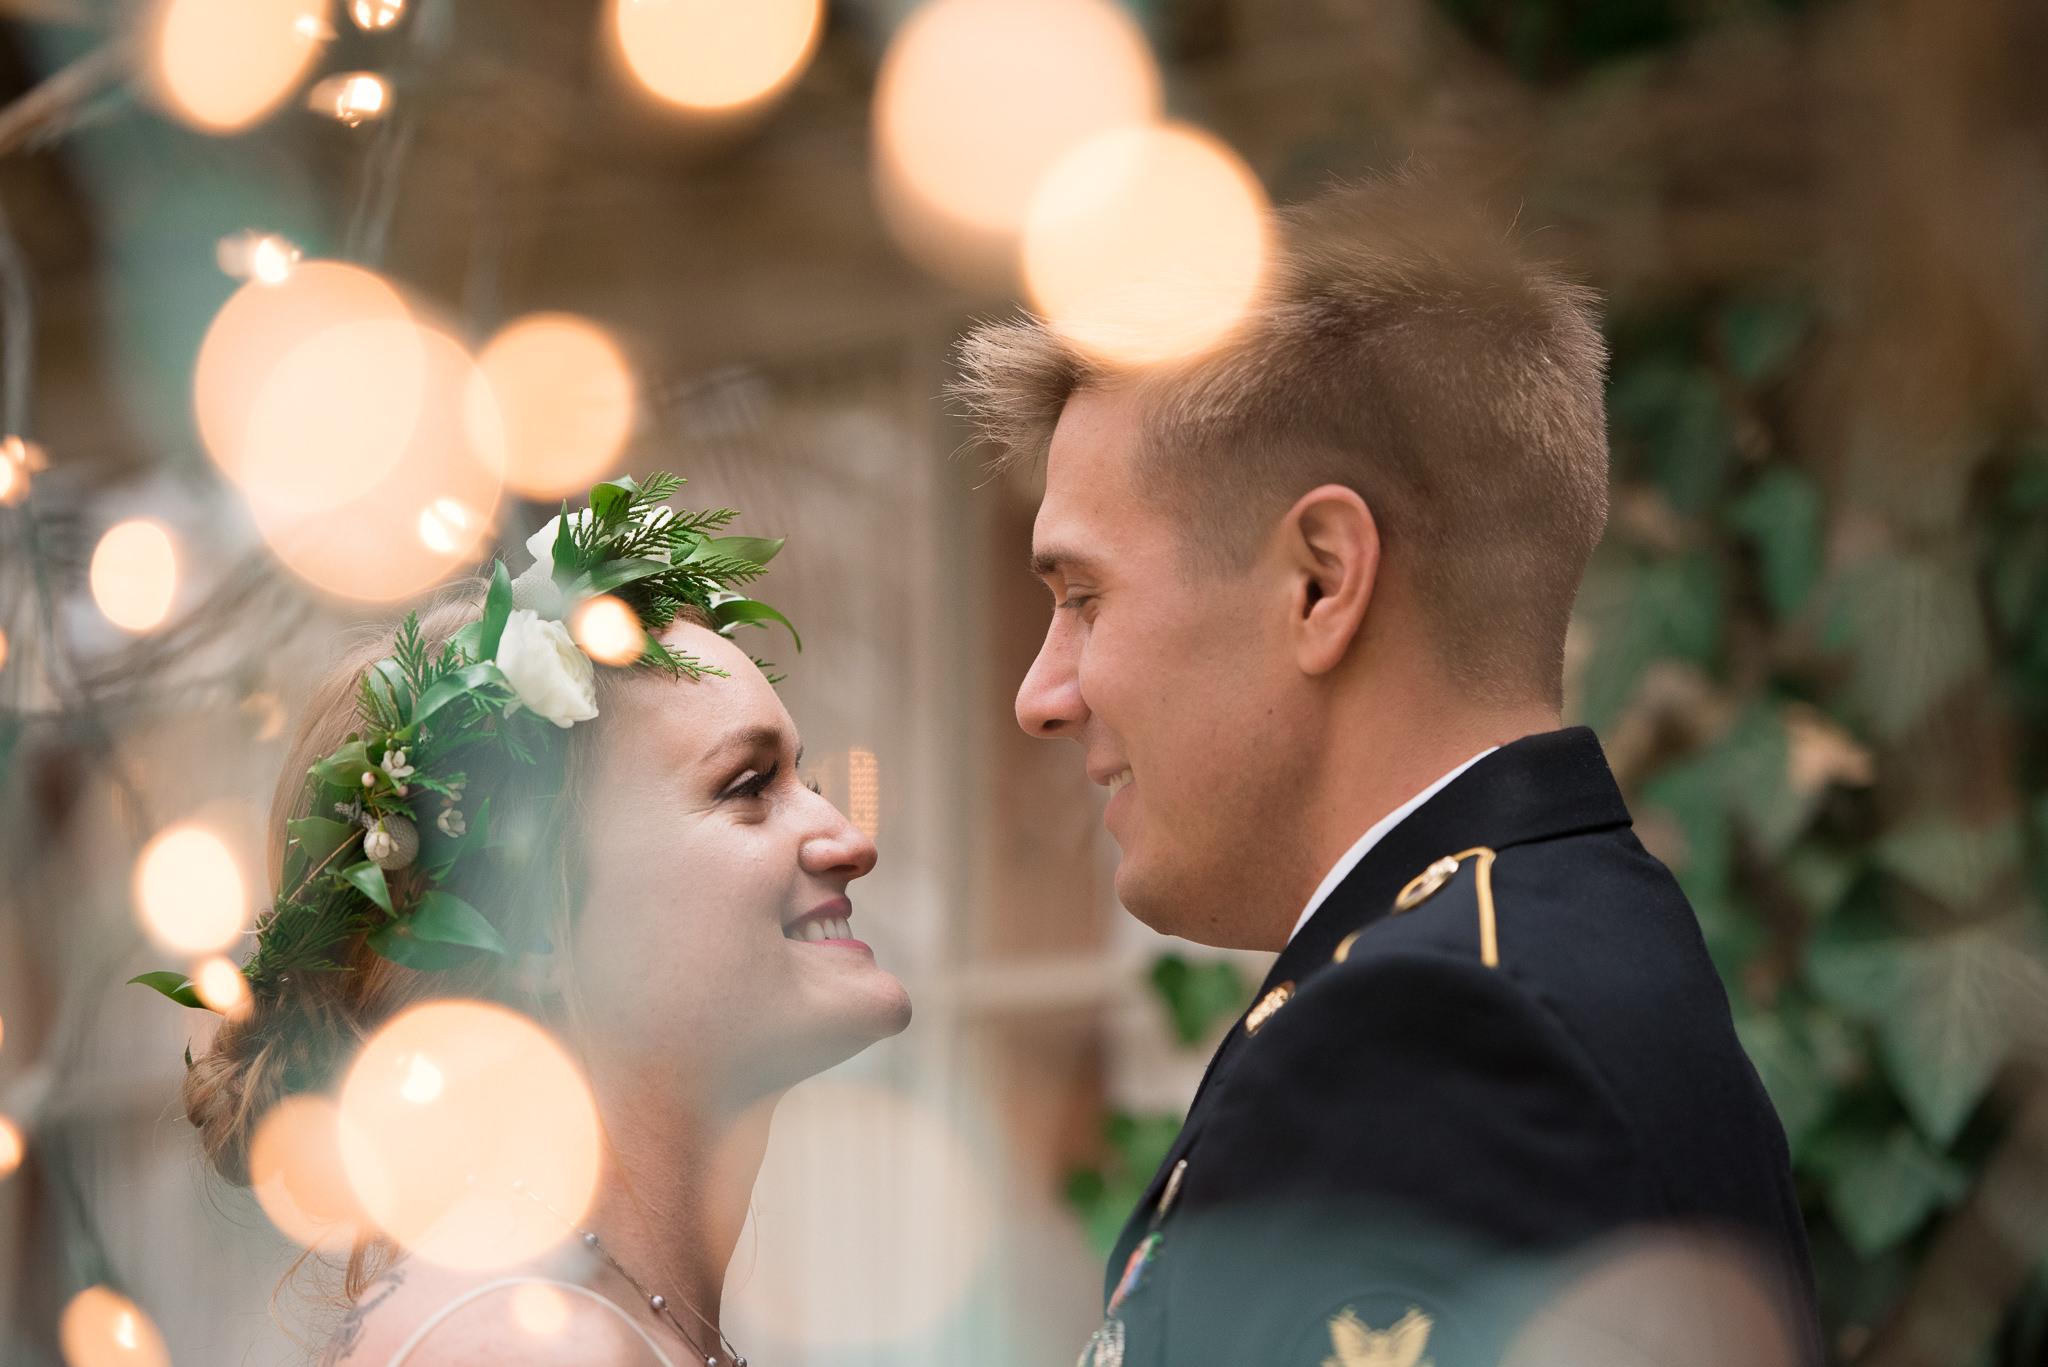 Trevor-Hooper-Wedding-Photographer-The-Bungalow-Wedding-Utah_CLR_036.jpg